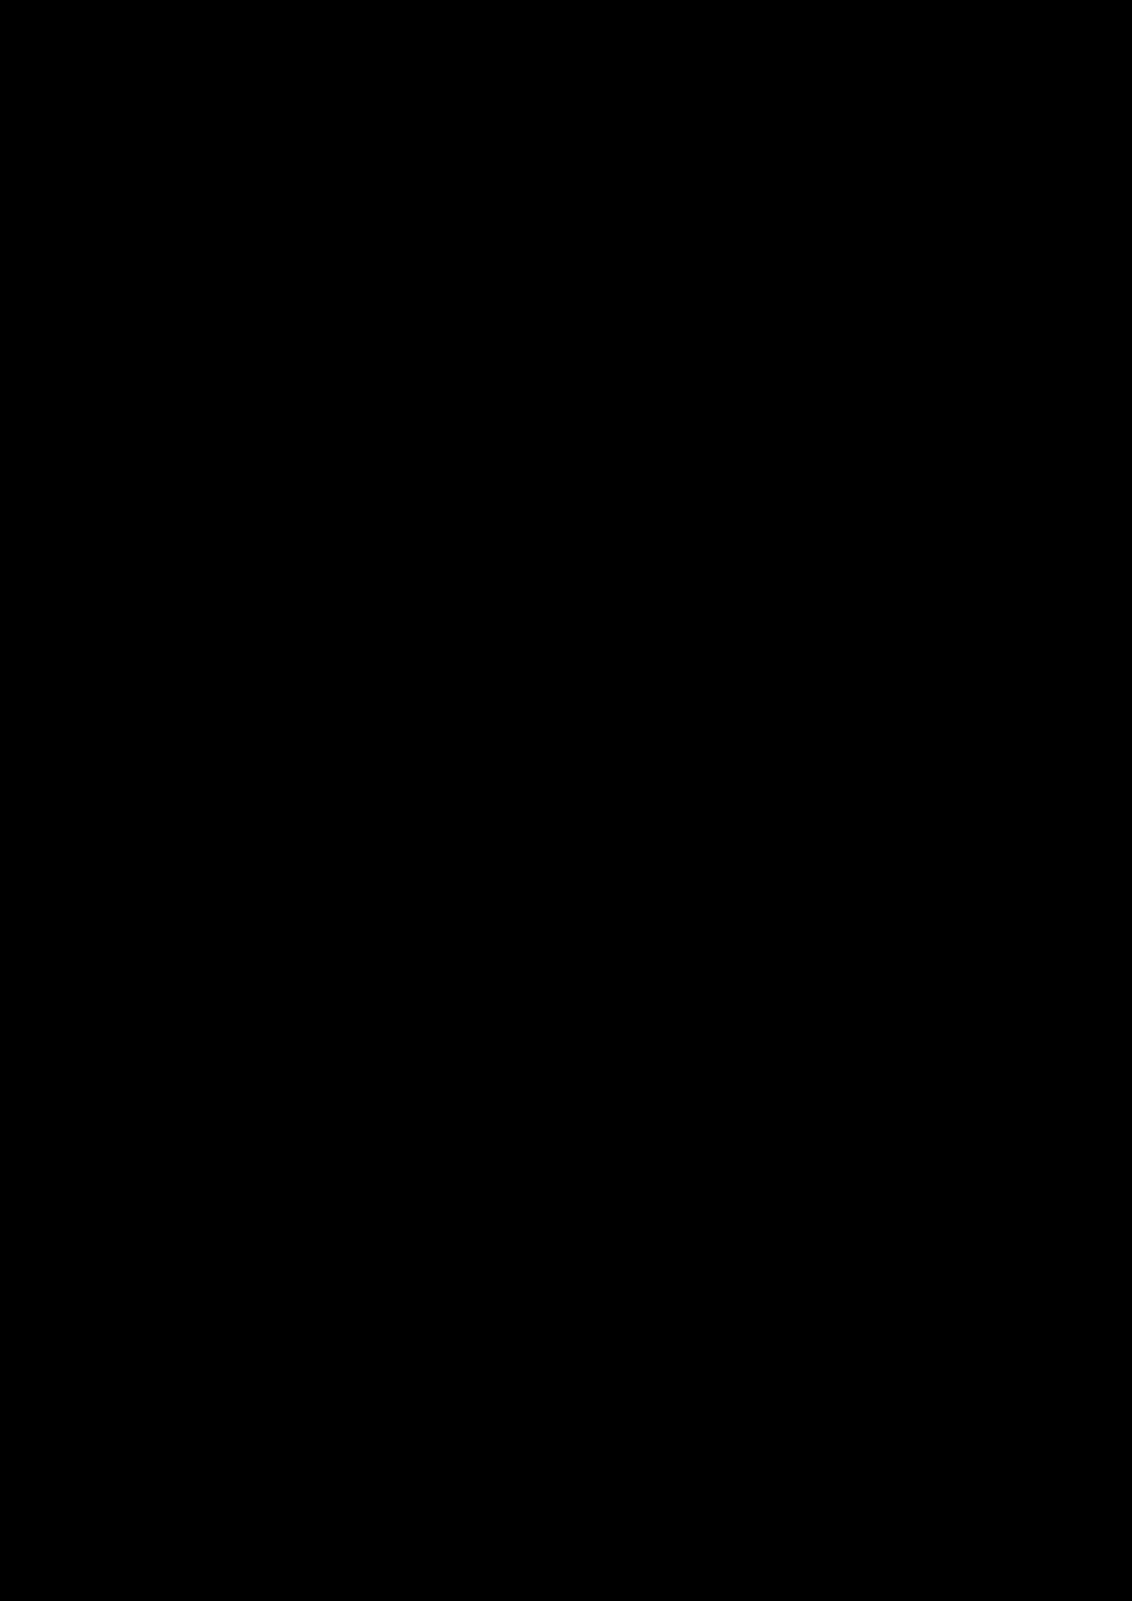 Belyiy sokol slide, Image 68